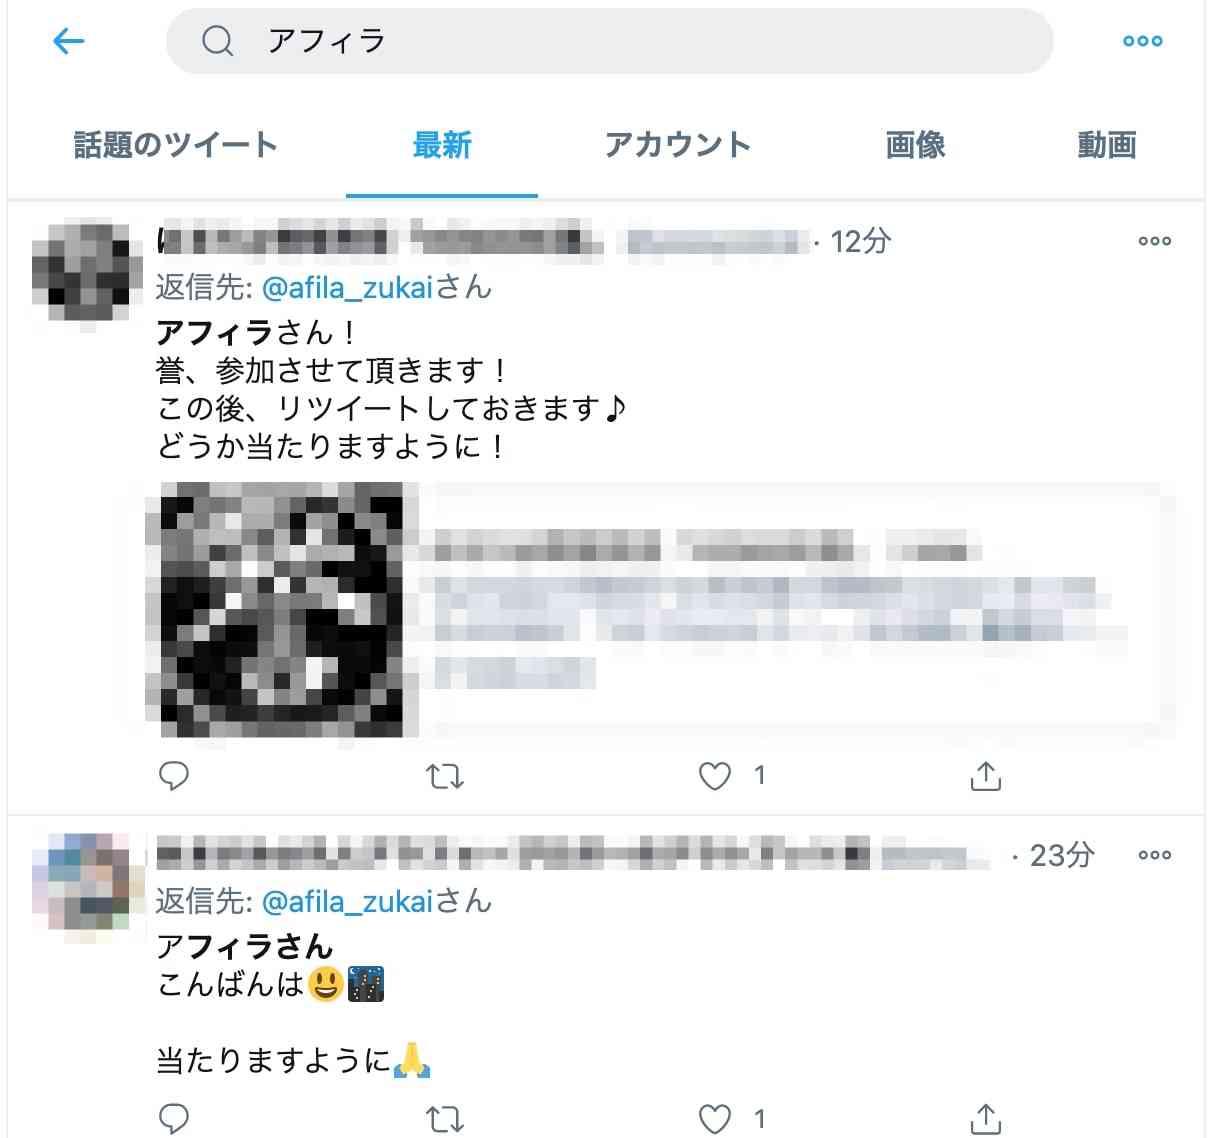 Twitterの除外検索方法③:URL付きツイートを除外で検索